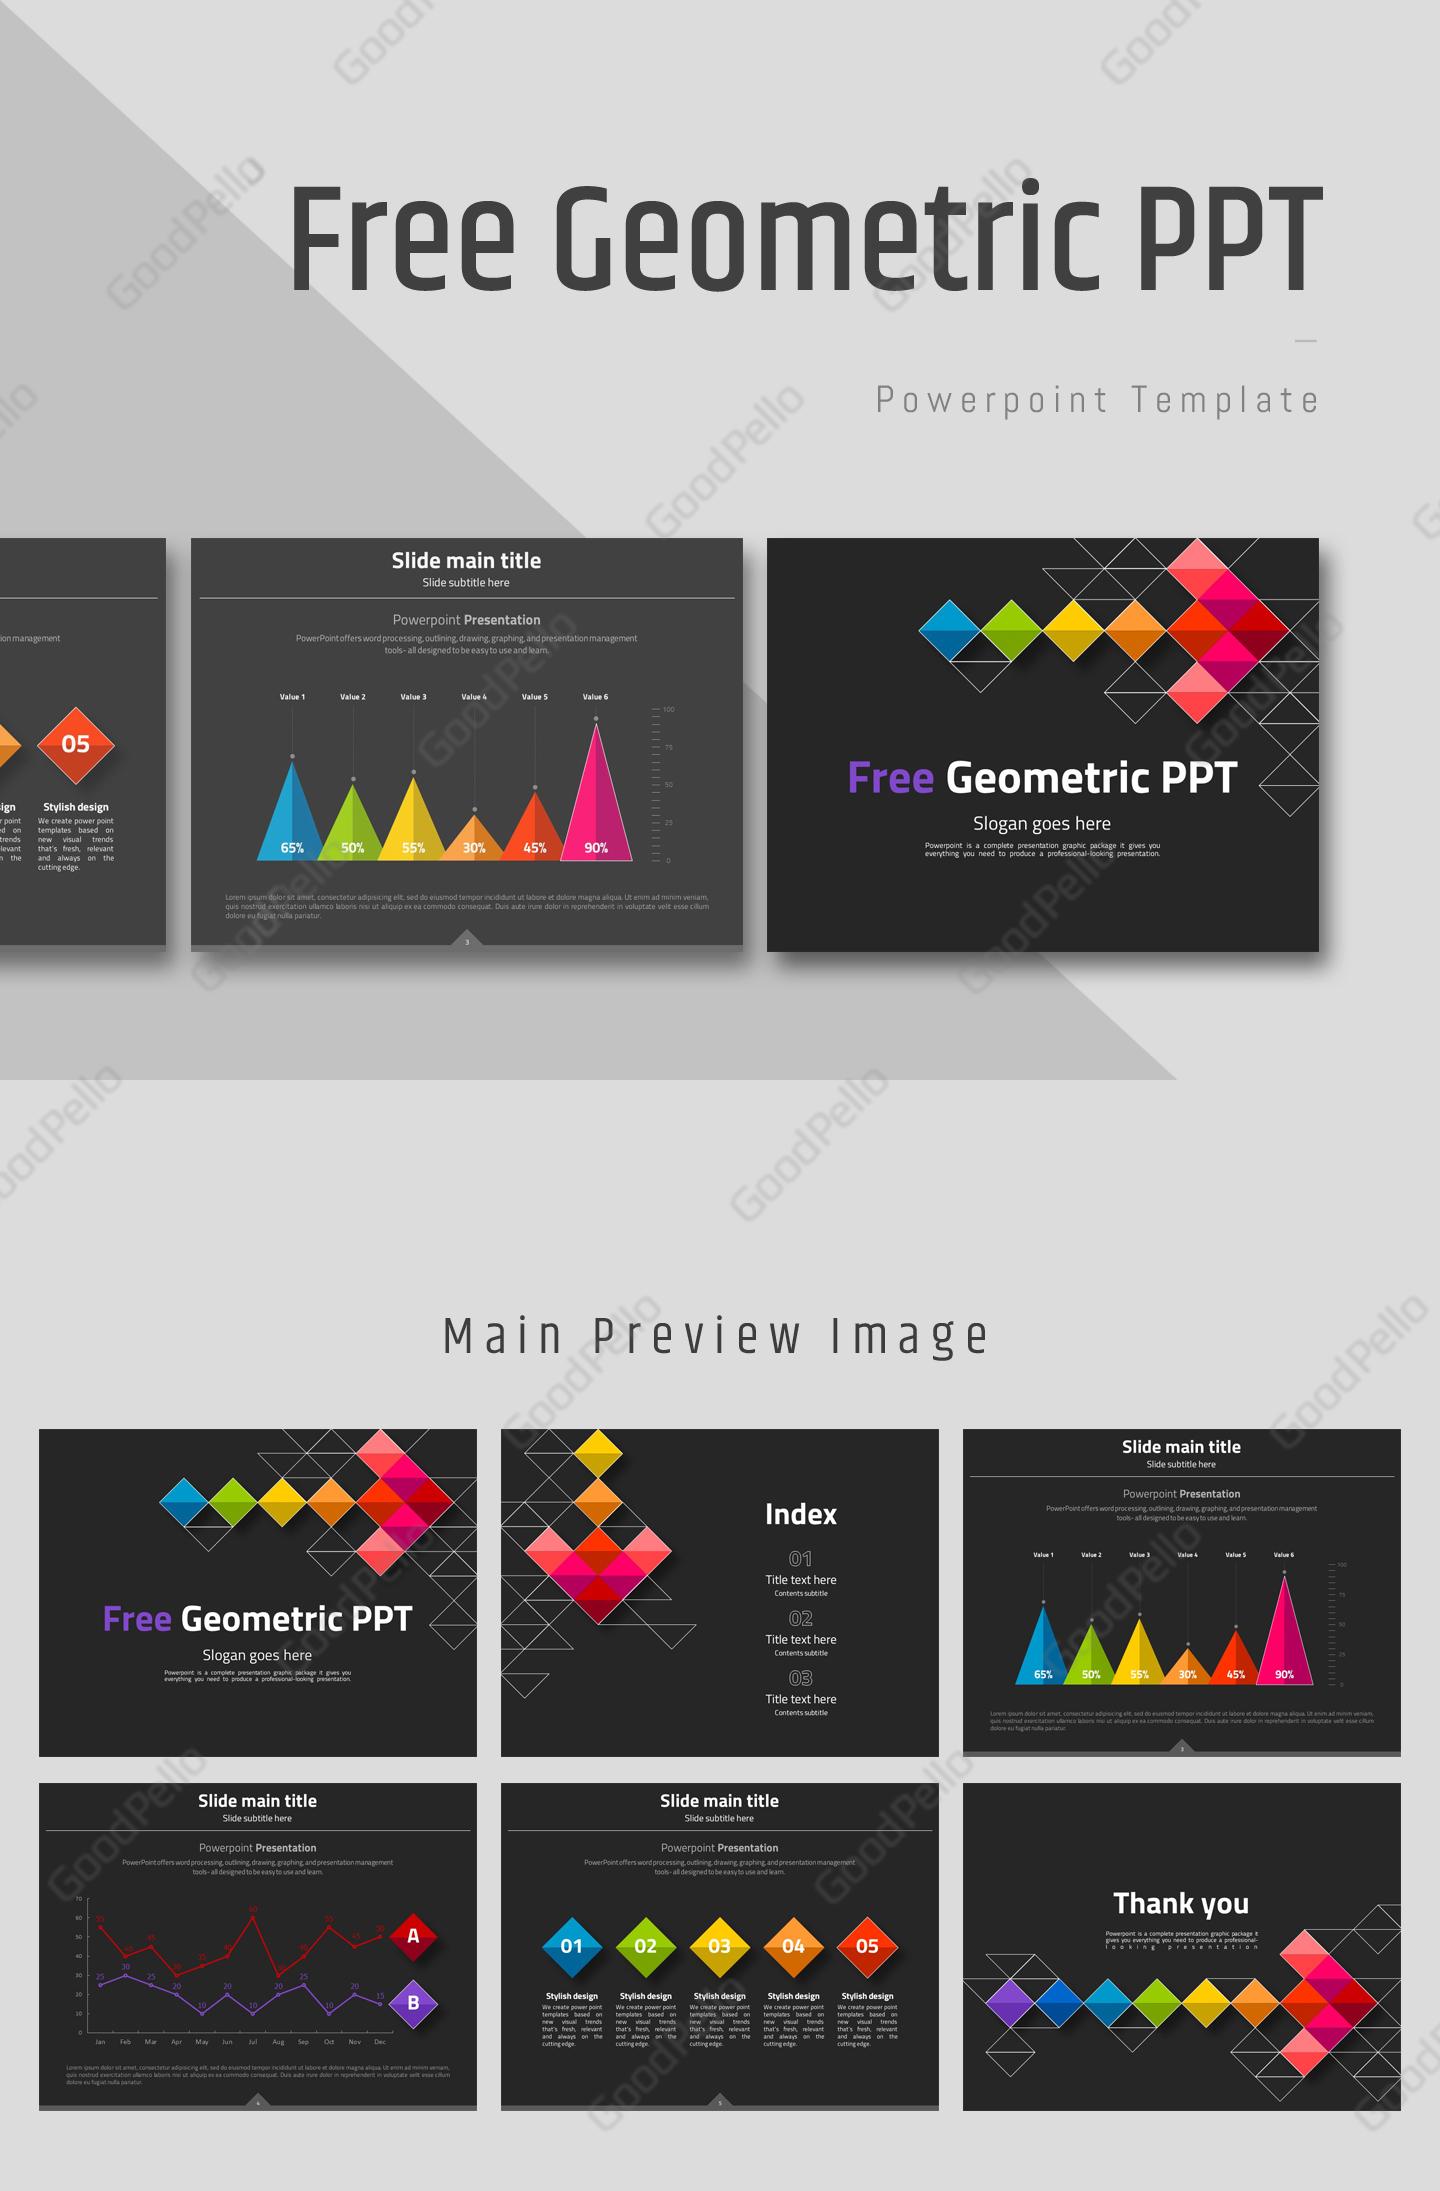 Free Geometric Powerpoint Template 고퀄리티 프레젠테이션 템플릿 굿펠로